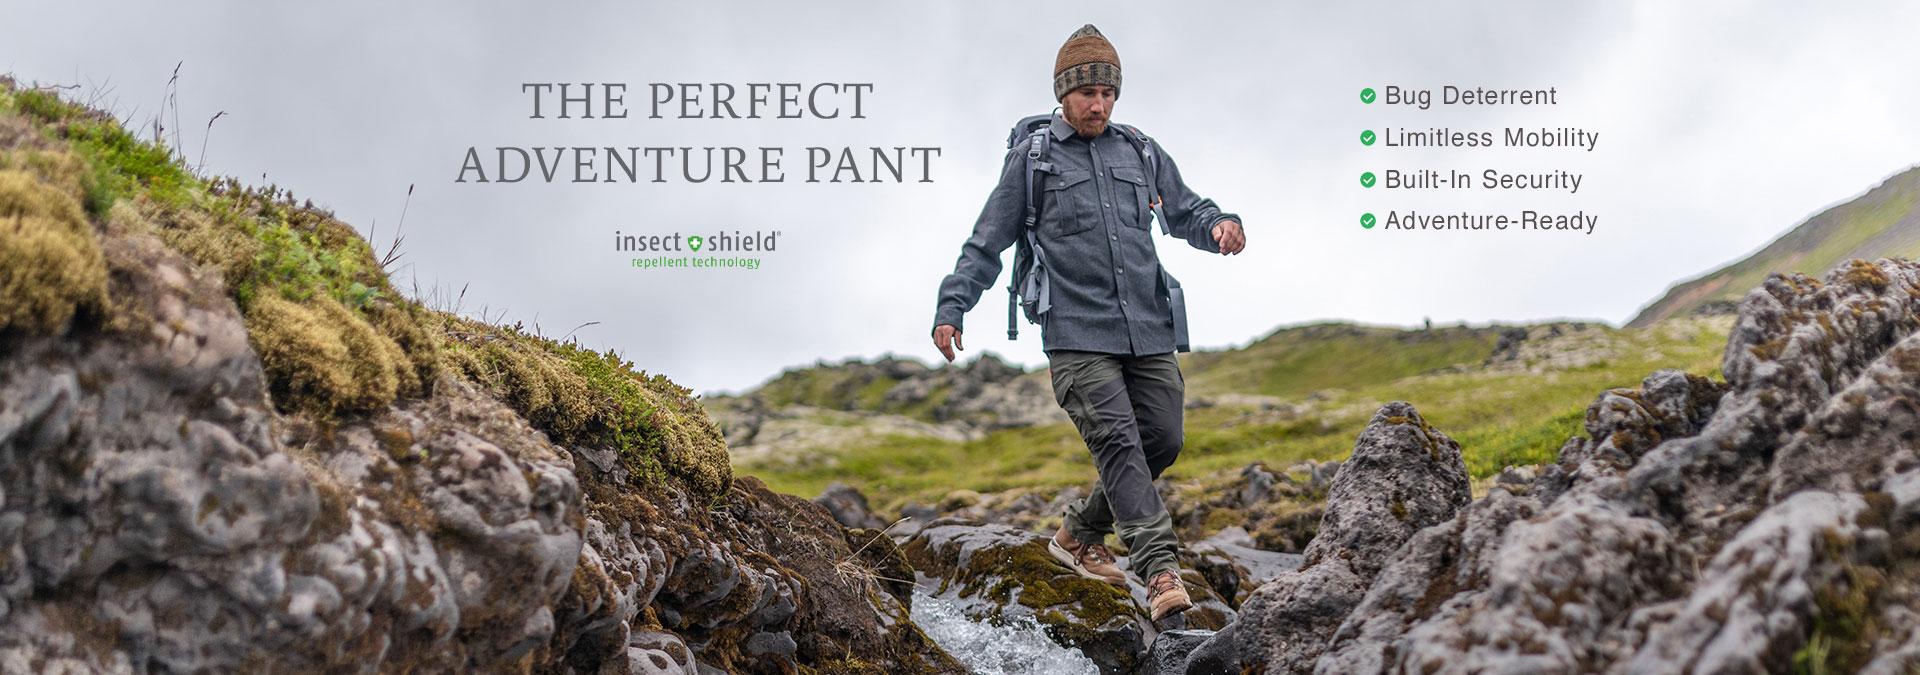 The Perfect Advenure Pant